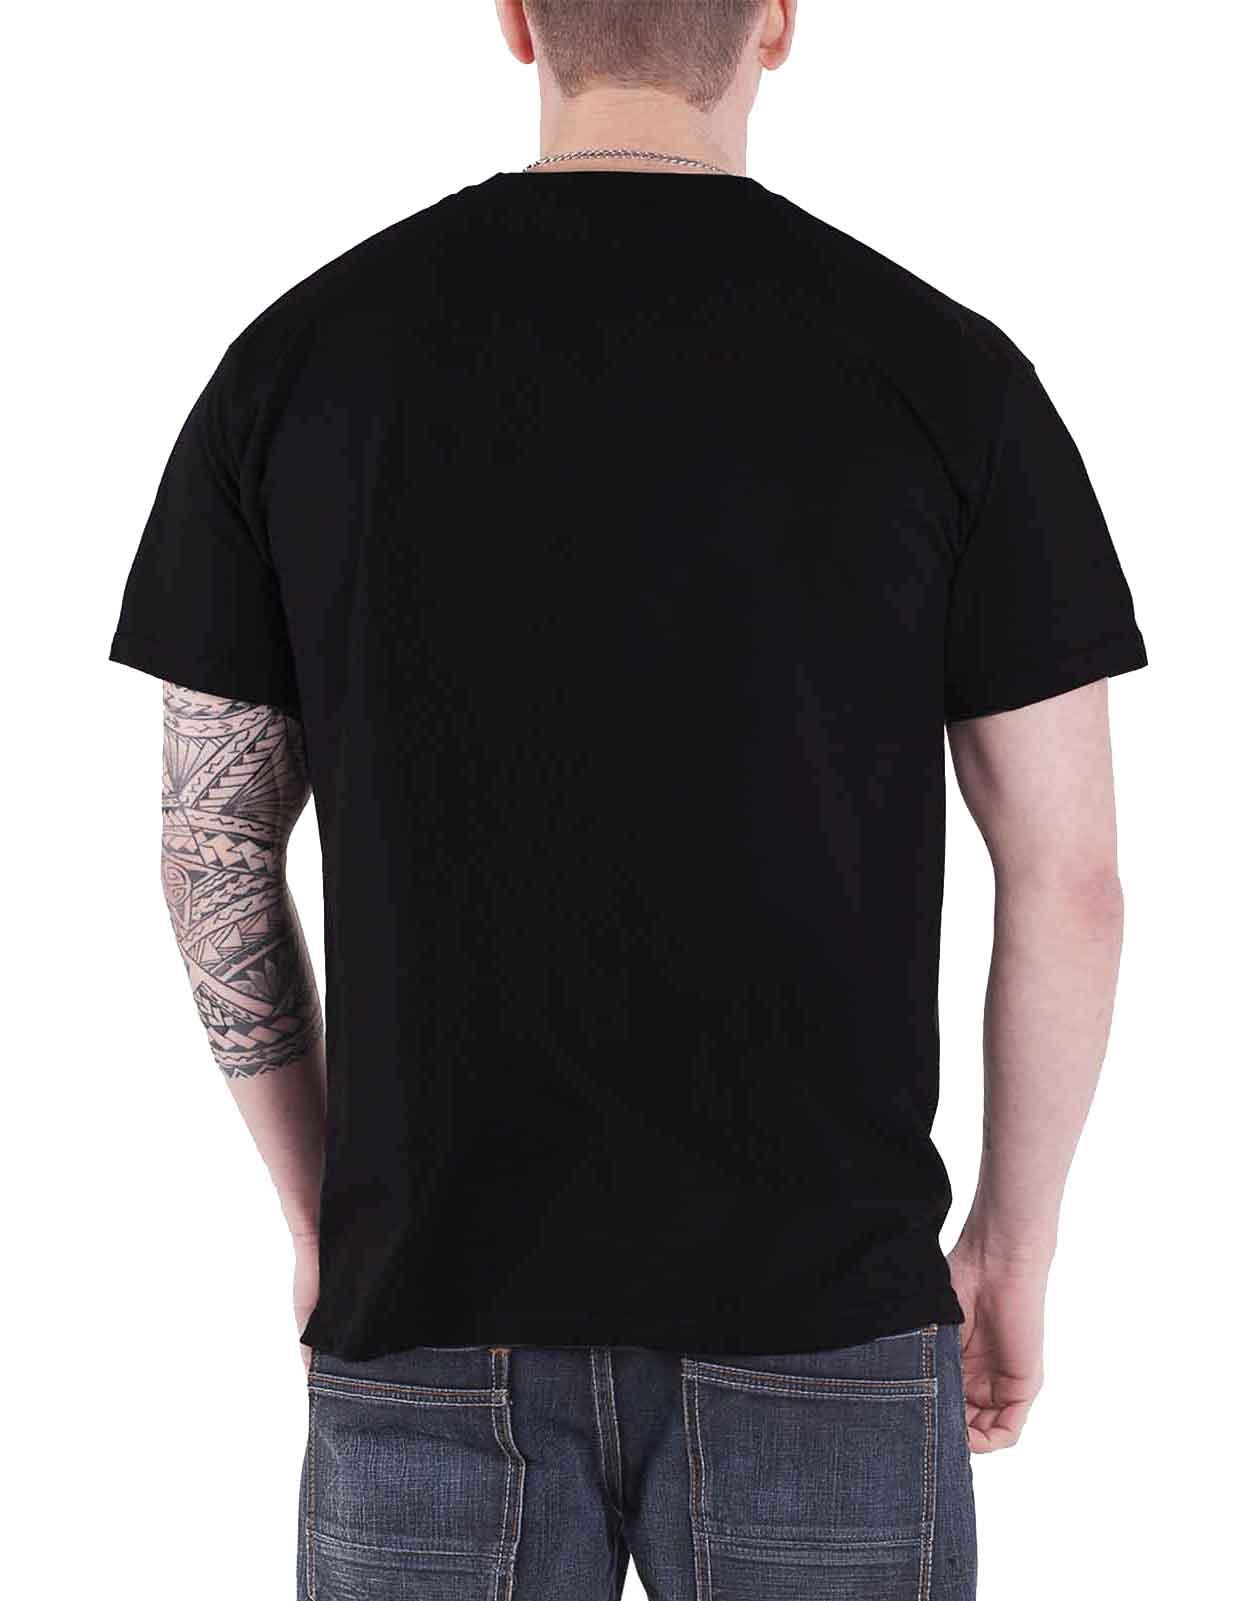 Officiel-Hawkwind-T-Shirt-Warrior-on-the-Edge-Space-Ritual-Doremi-homme-nouveau miniature 11